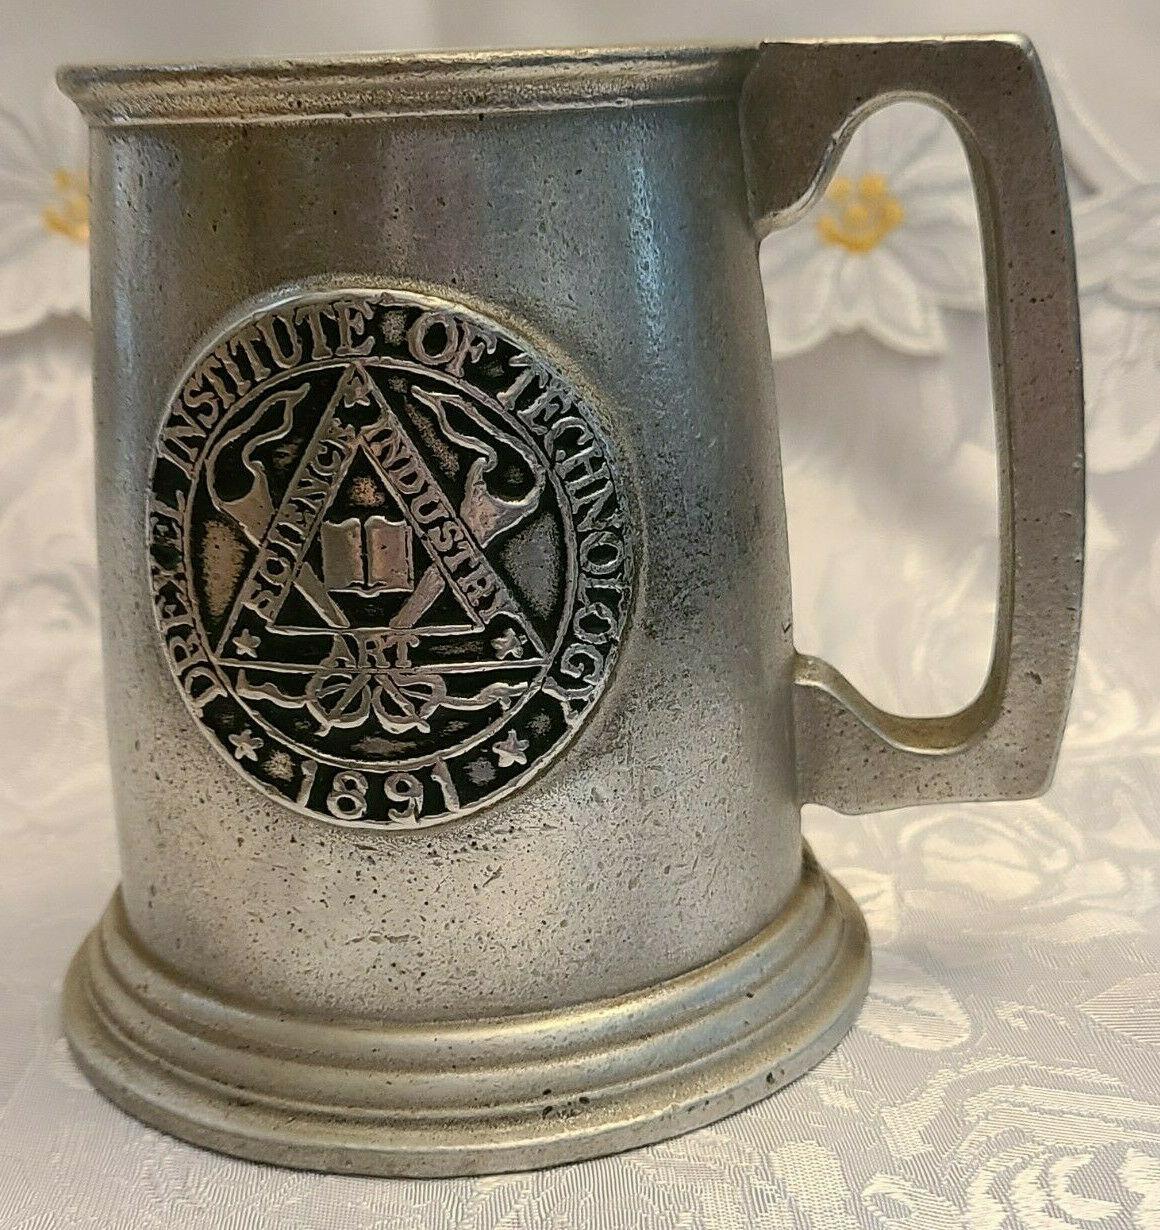 Vintage Drexel Institute of Technology Science Industry Art Pewter Mug 1891